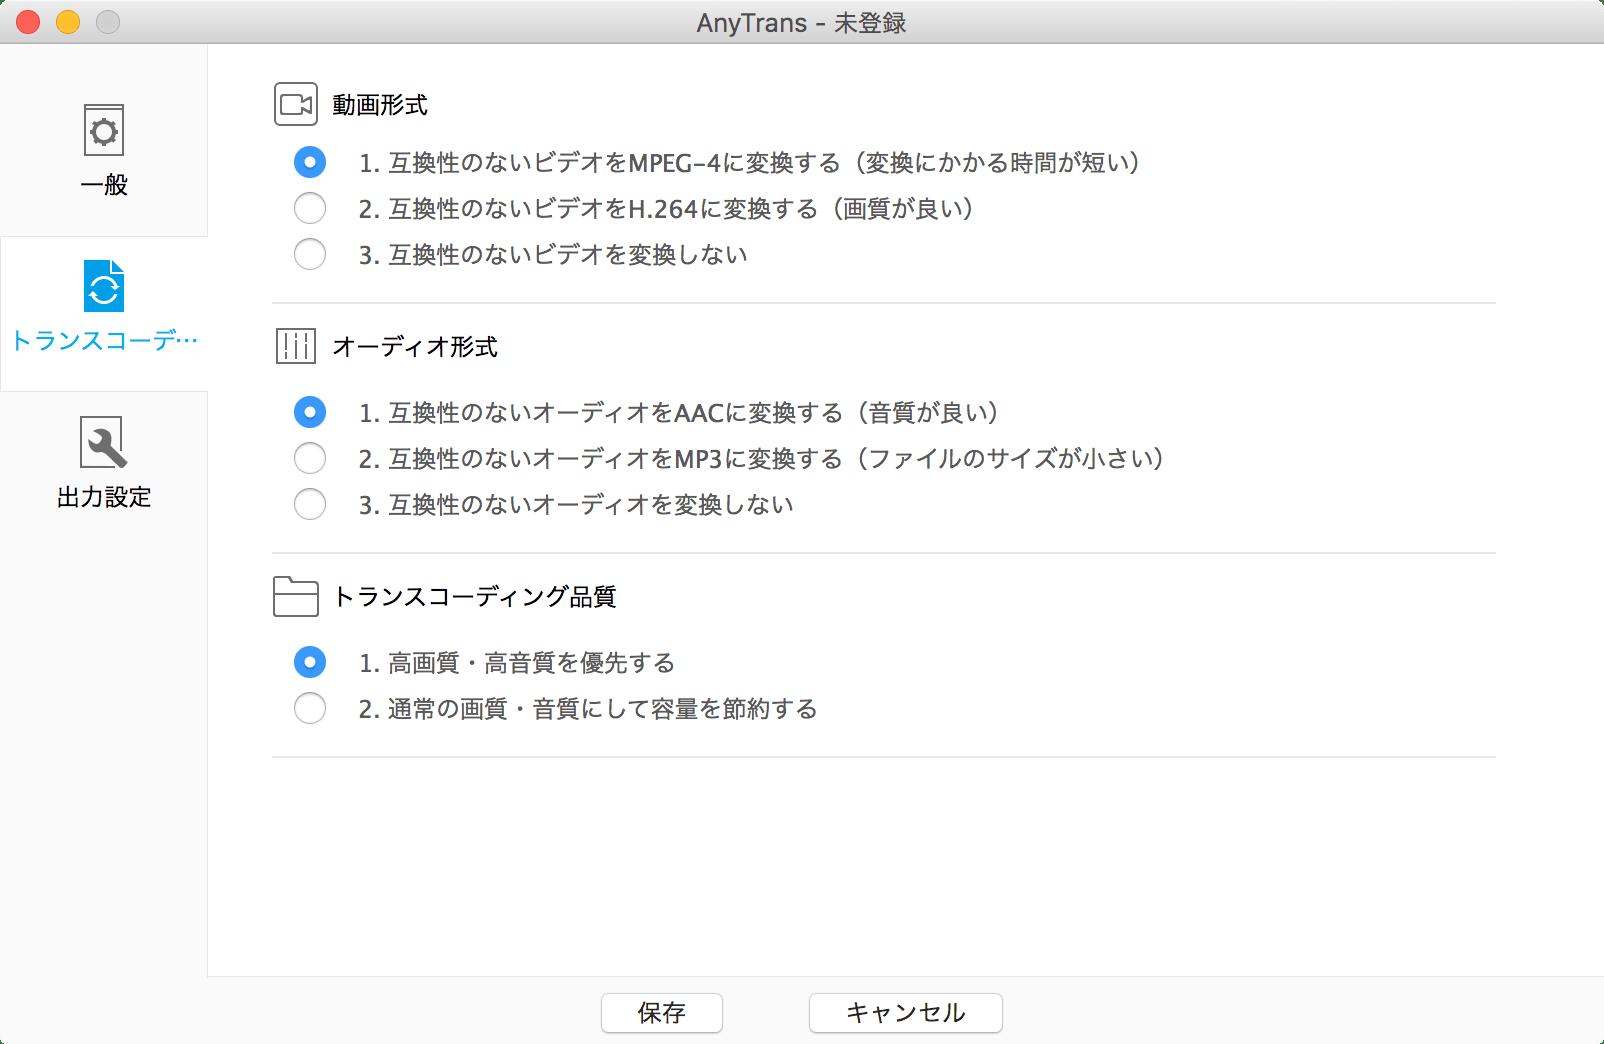 09_20160229_anytrans